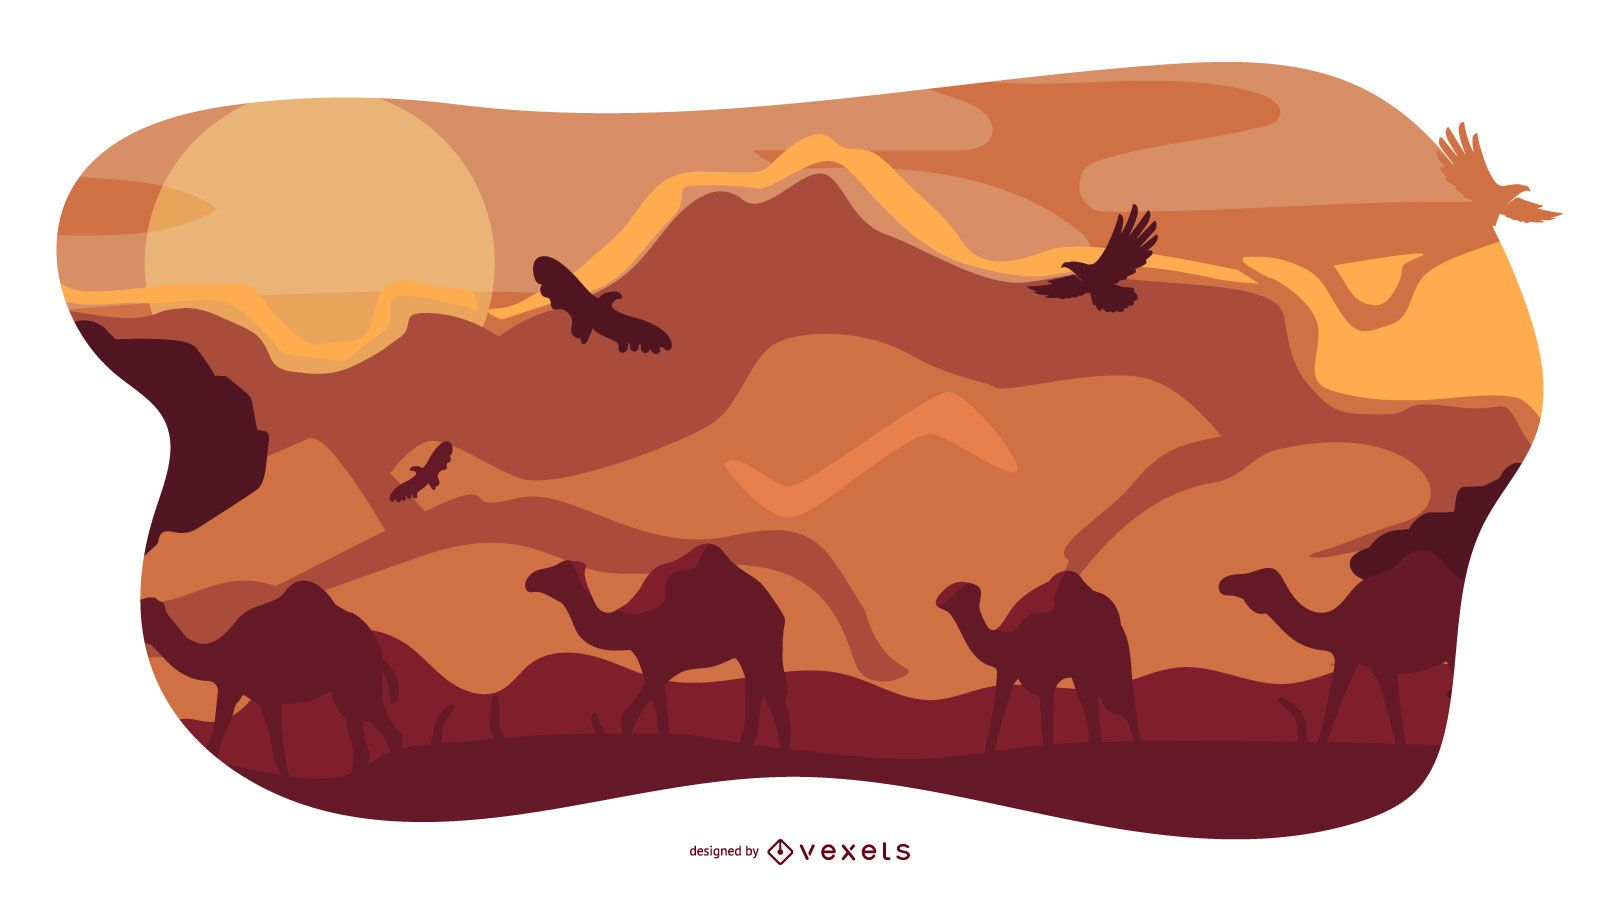 Diseño de composición de paisaje animal africano